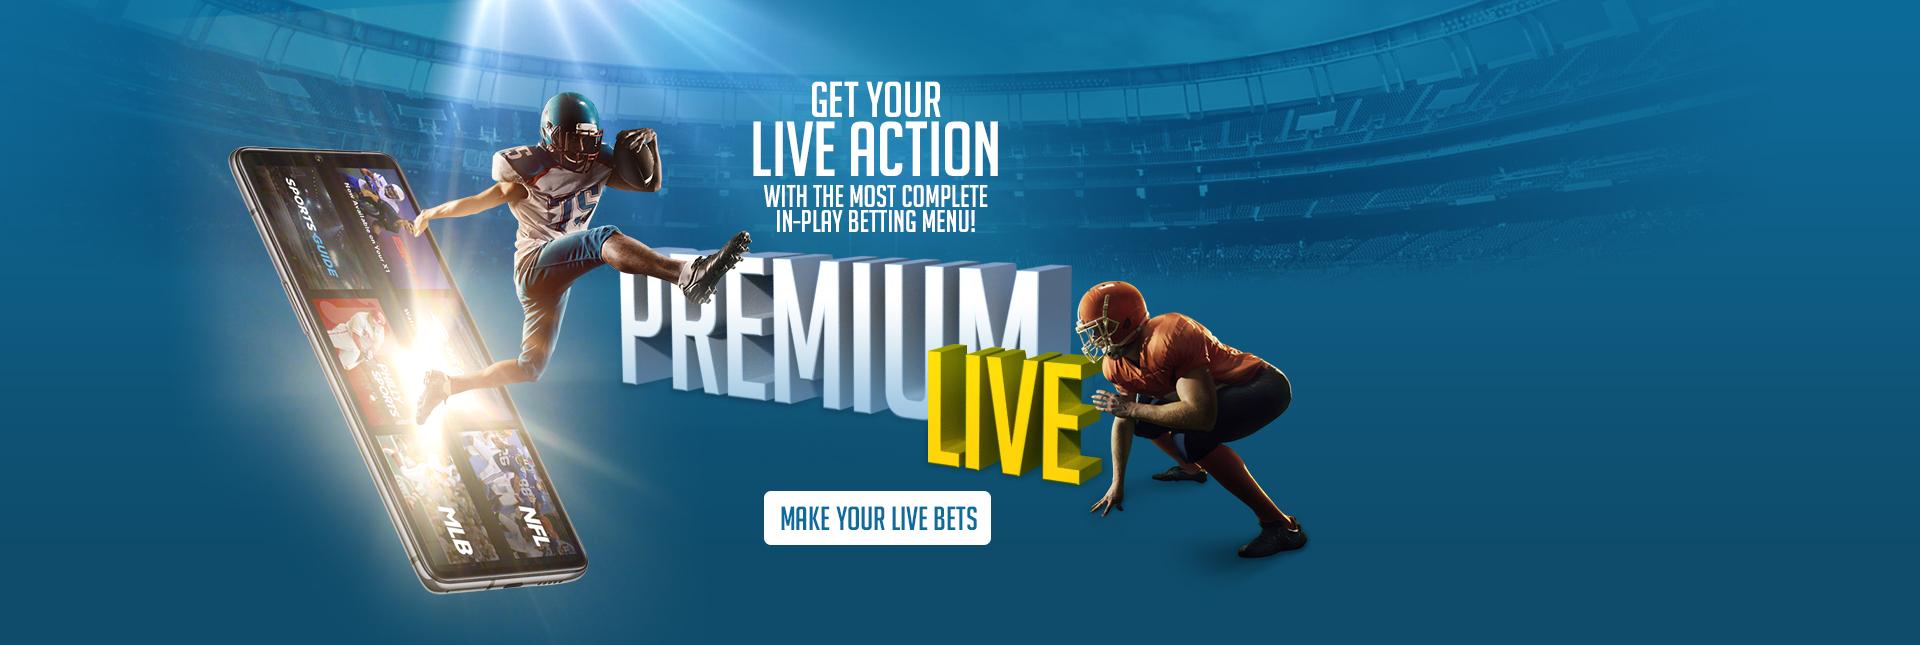 Premium Live Betting